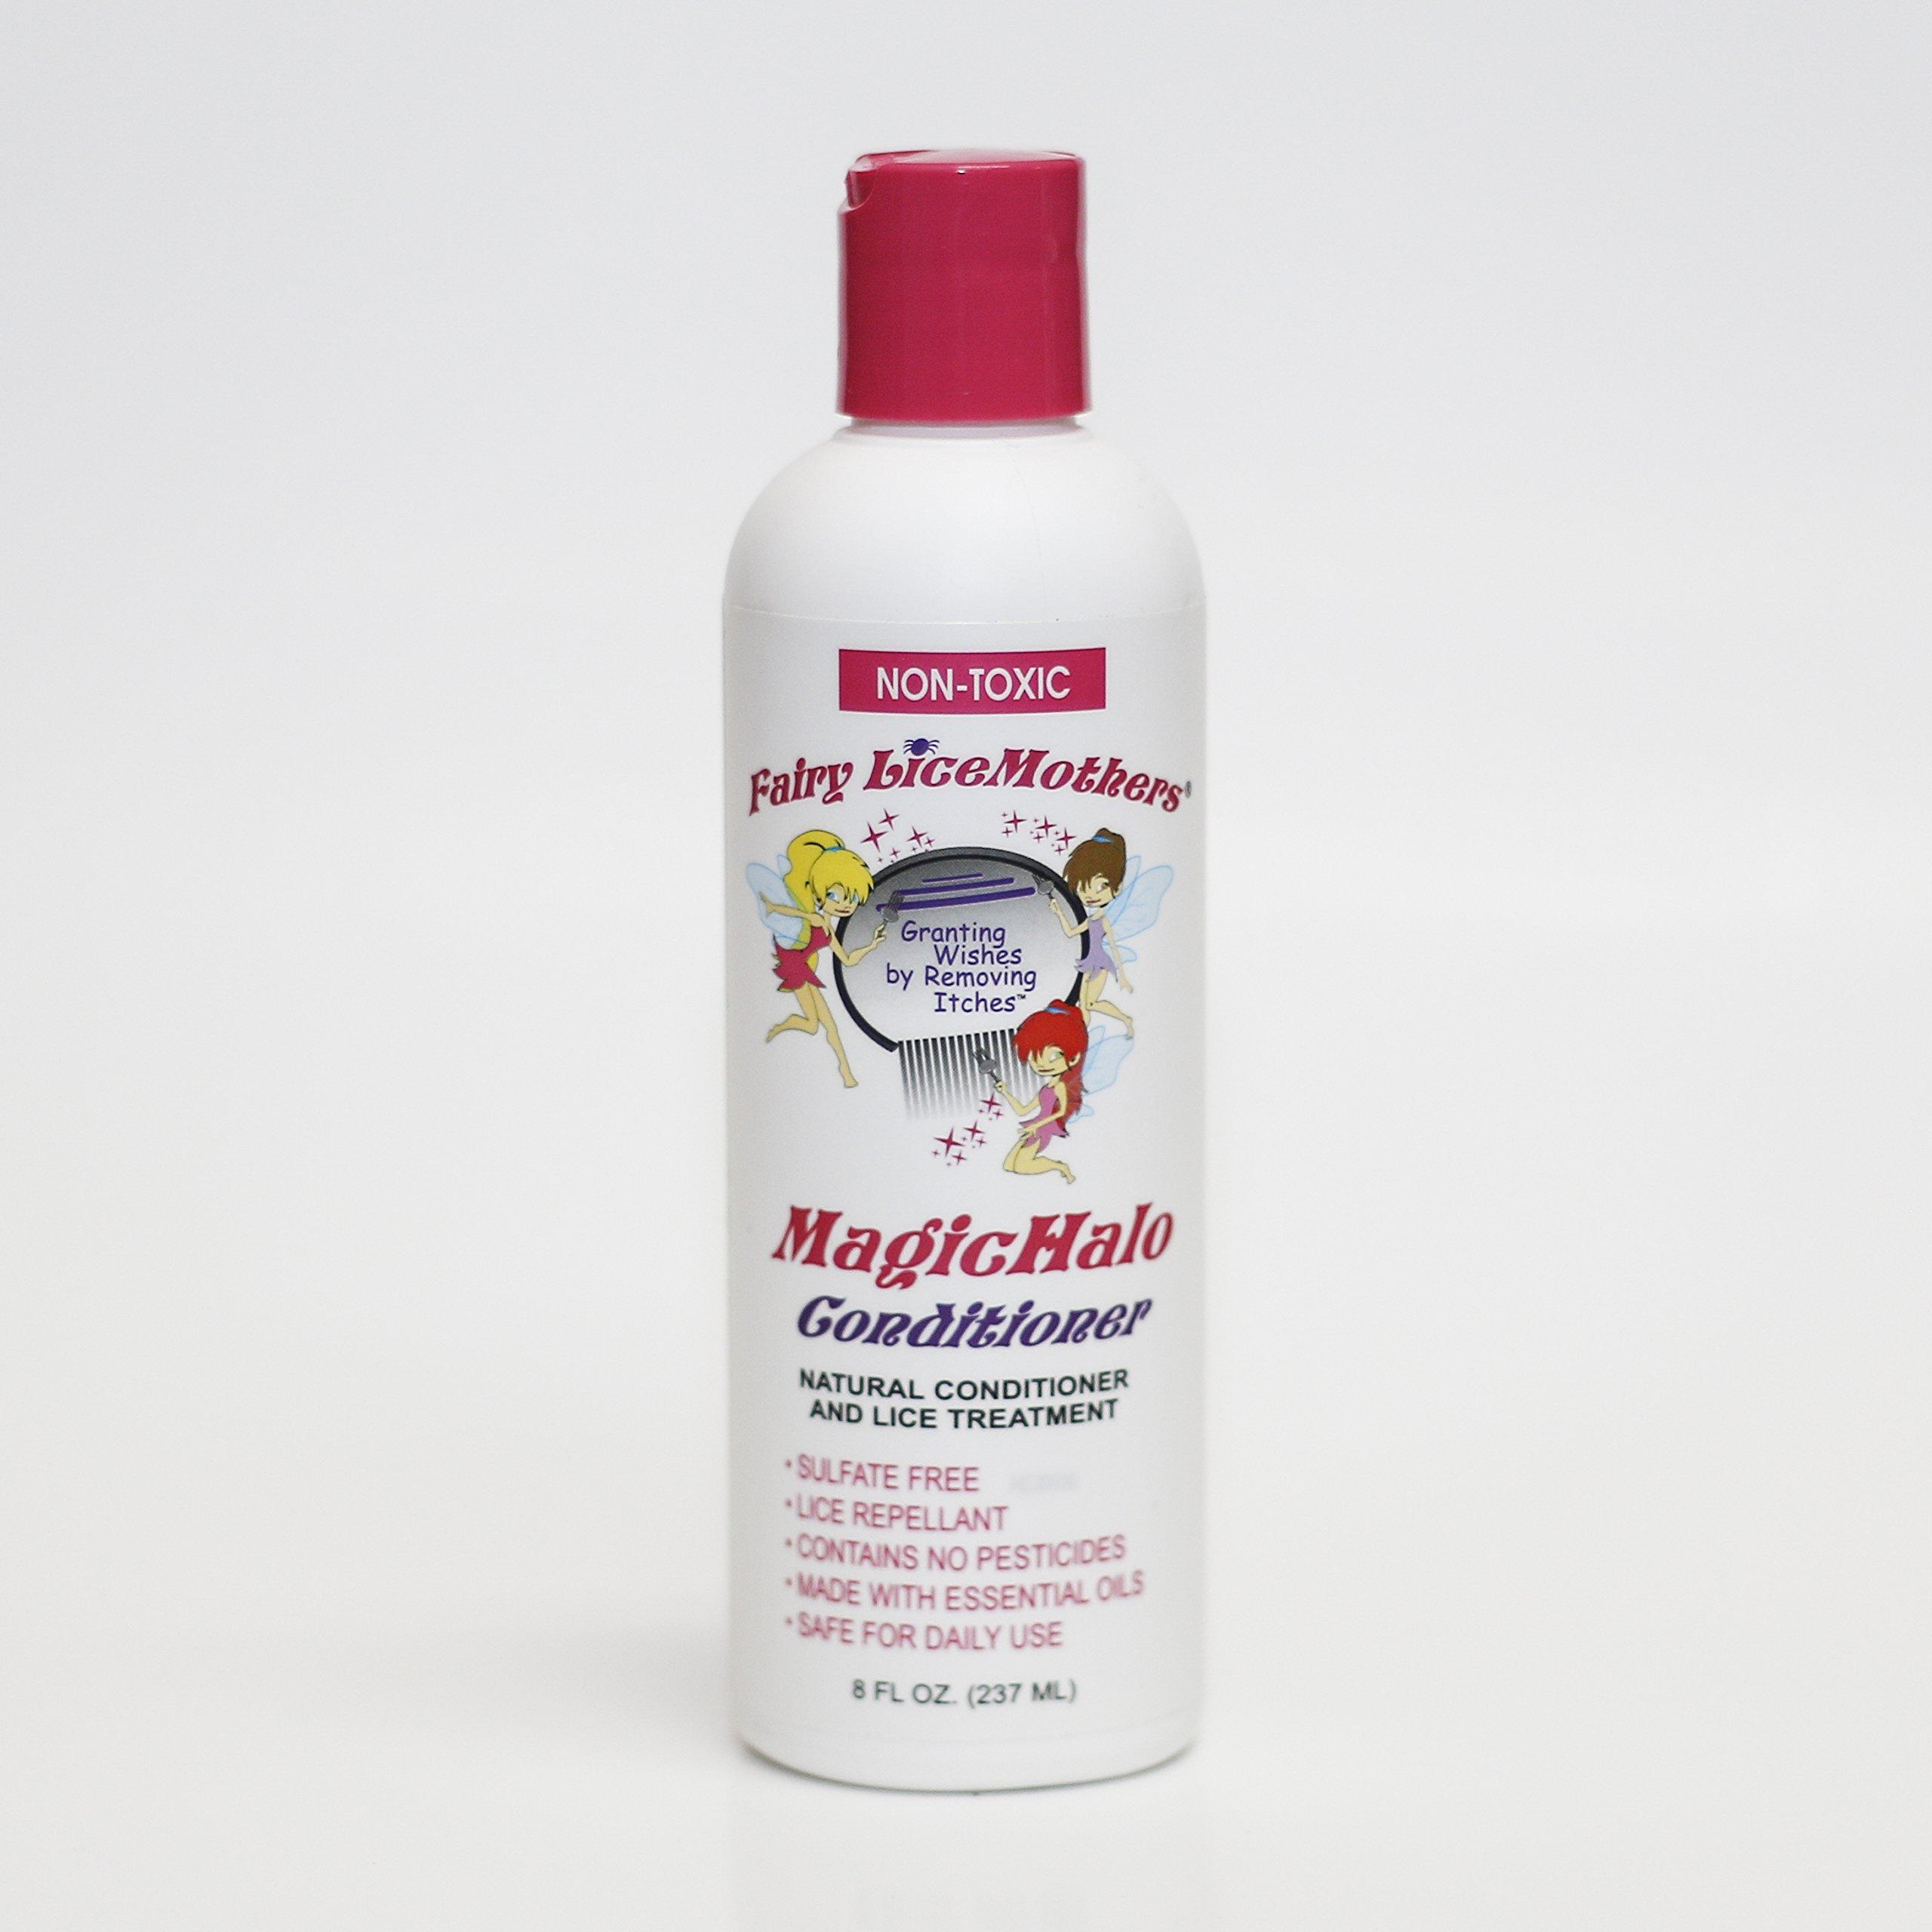 Fairy LiceMothers MagicHalo Conditioner - Head Lice Conditioner (8 fl. oz.)